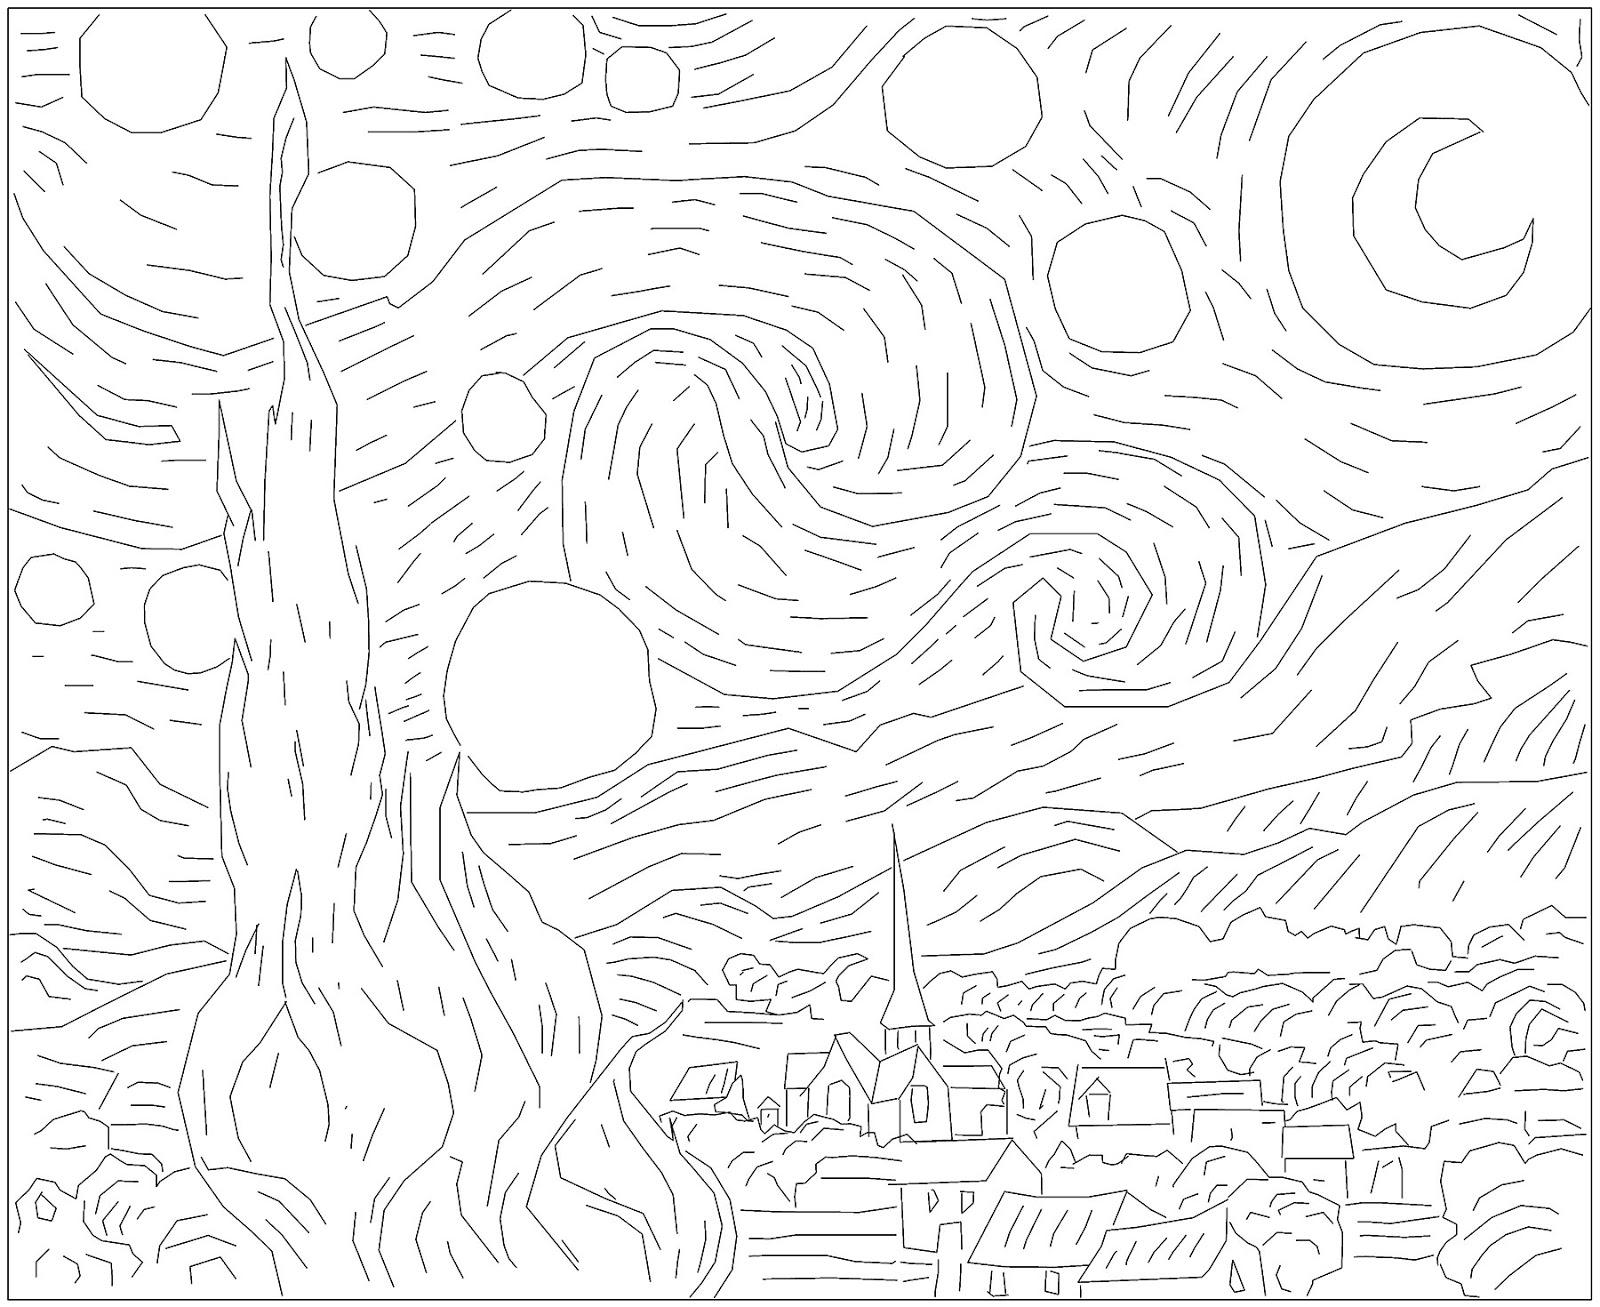 must, see, must see, Sterrennacht, de, sternennacht, von, vincent, van, gogh, art, minimal art, reproduction art, simple, basic, lines, views, cheers, moon, plants, houses, stars, trees, palm, andreas, warren, matti, artist, modern art, awm goes crazy, awm, crazy, goes, awm photography, photography, lines, simple art,